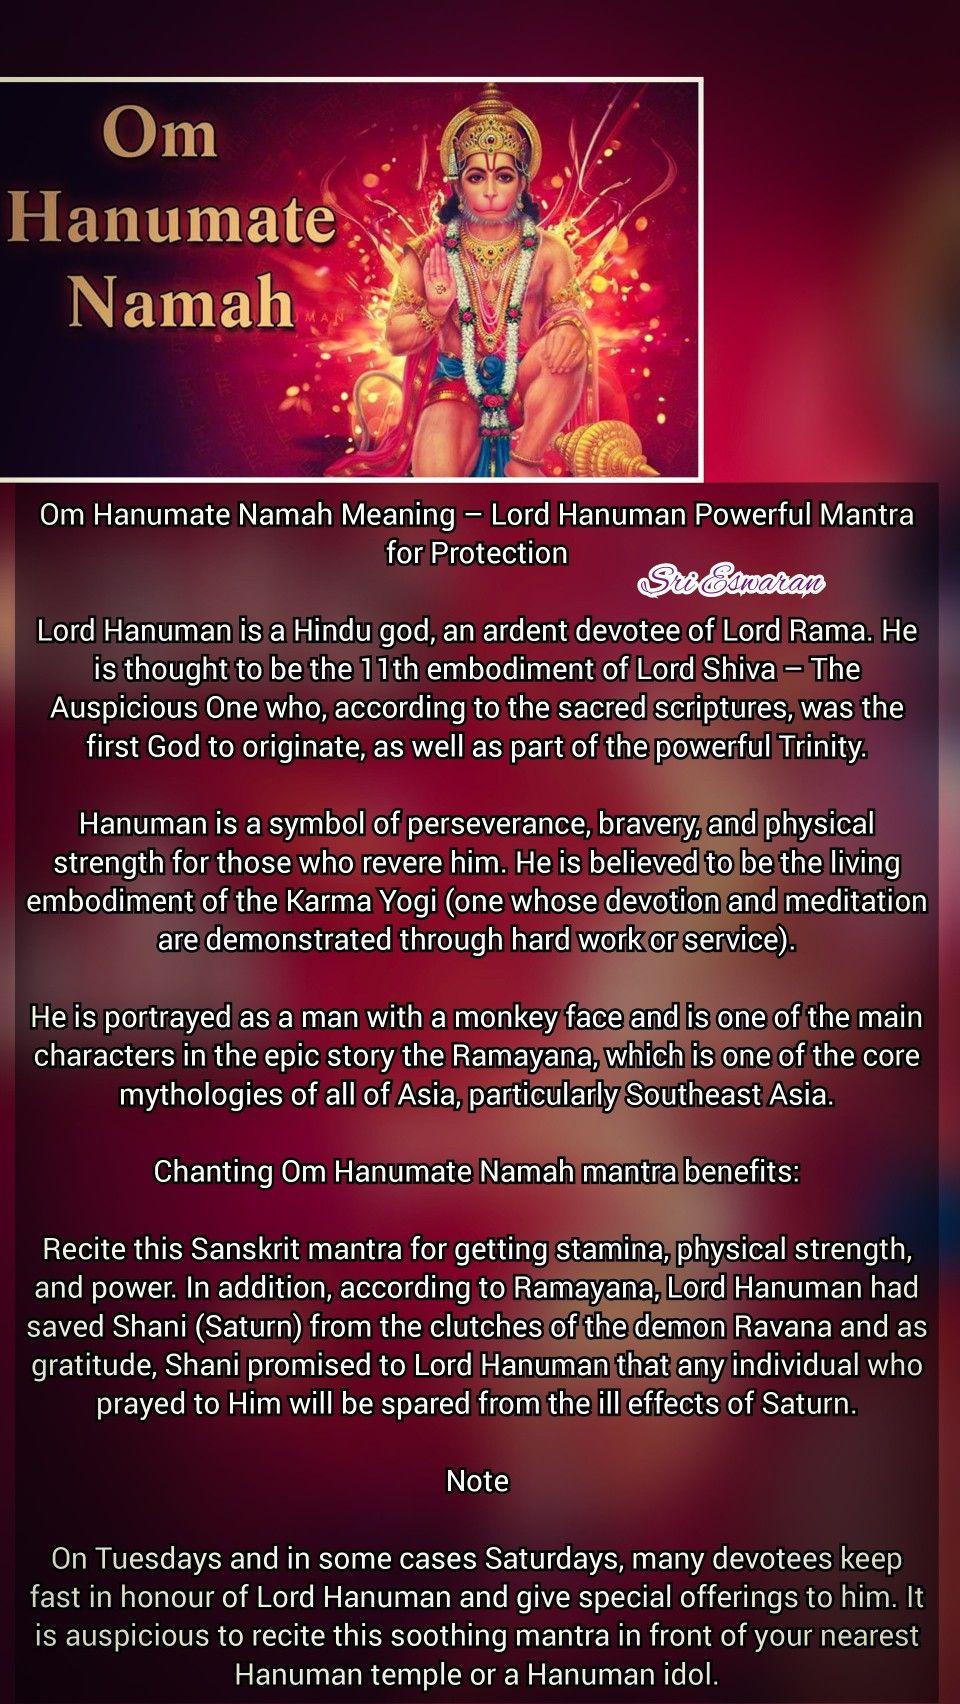 Om Hanumate Namah Meaning – Lord Hanuman Powerful Mantra for